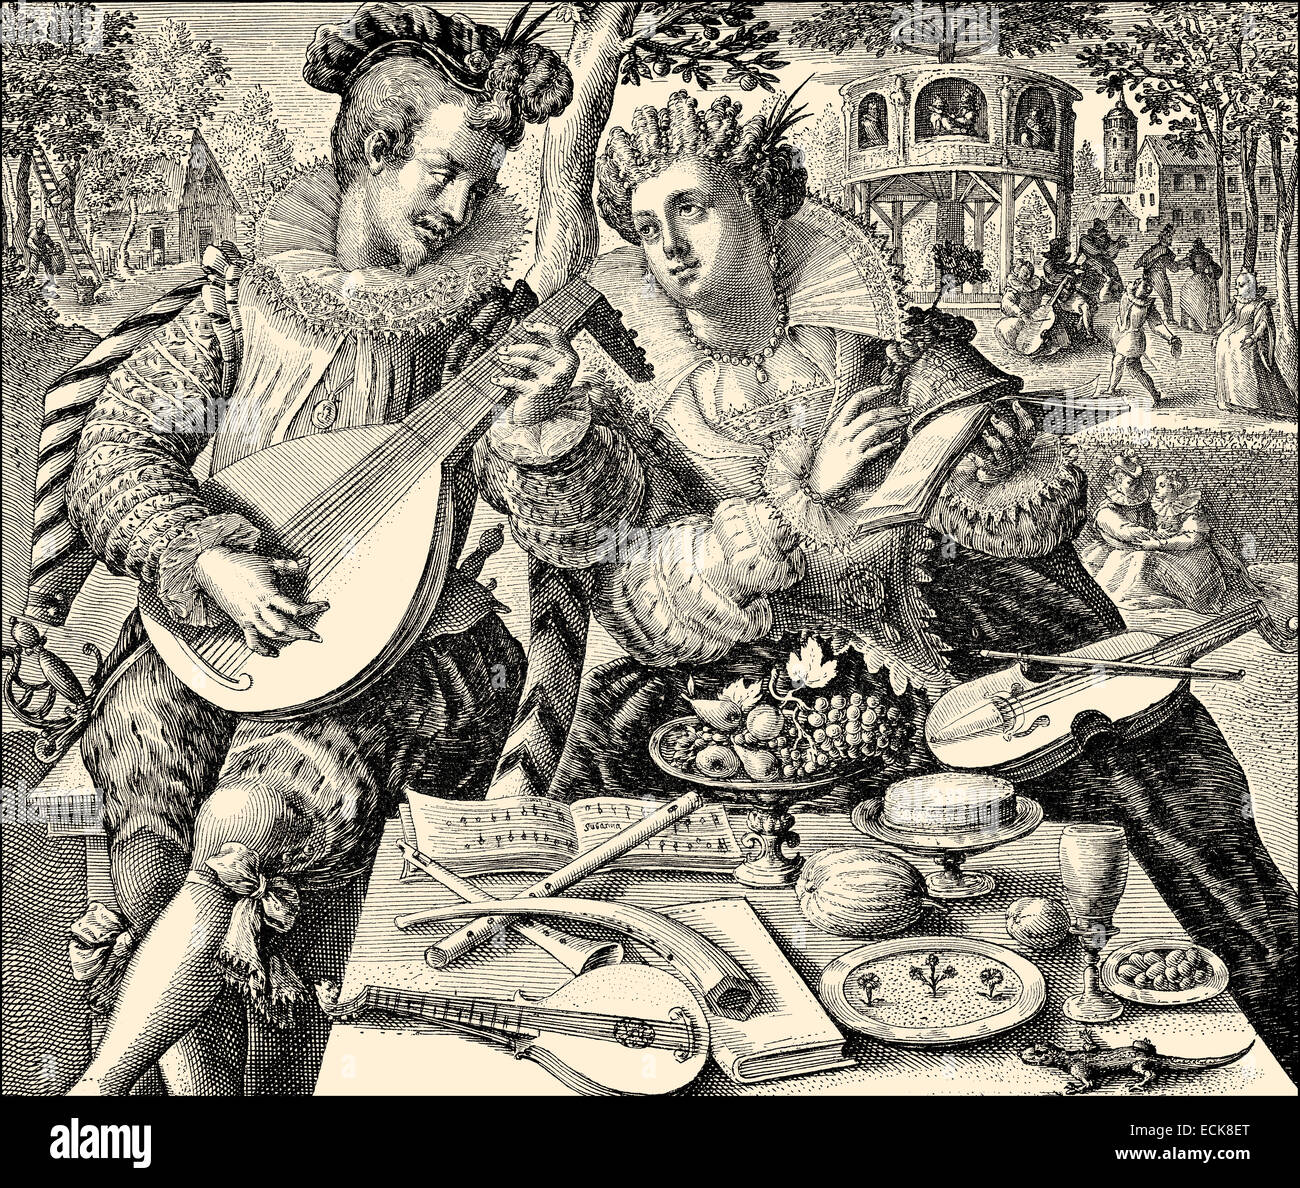 A couple making music, 16th century, Germany, Europe, ein Liebespaar musiziert, 16. Jahrhundert, Deutschland, Europa - Stock Image